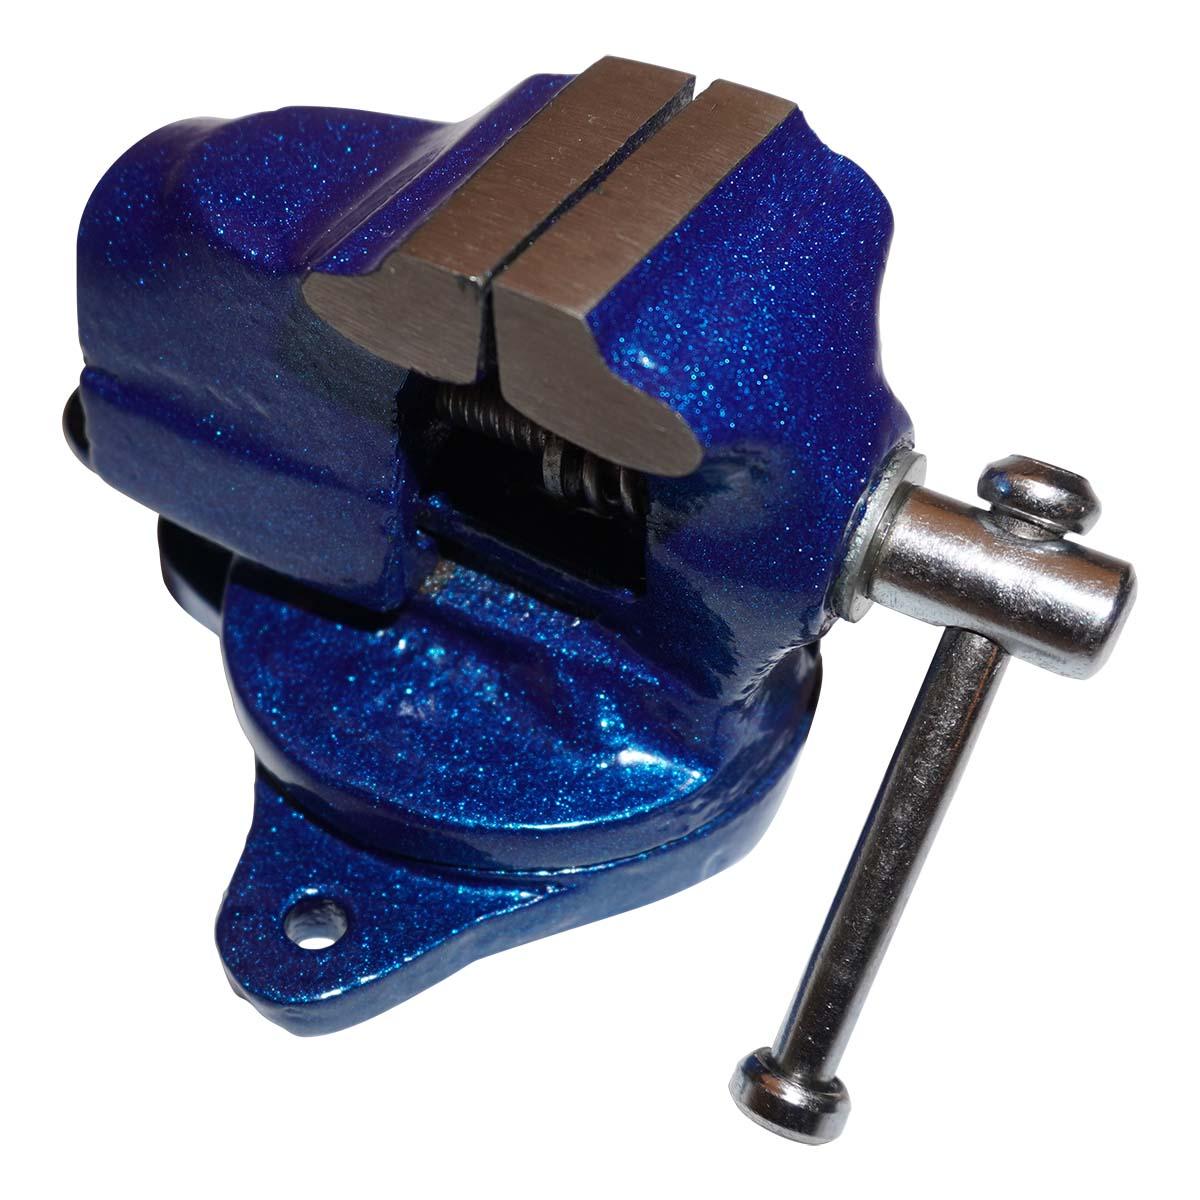 Vis Revolving Mini Bench Vise 1 1 4 Inch Bench Type